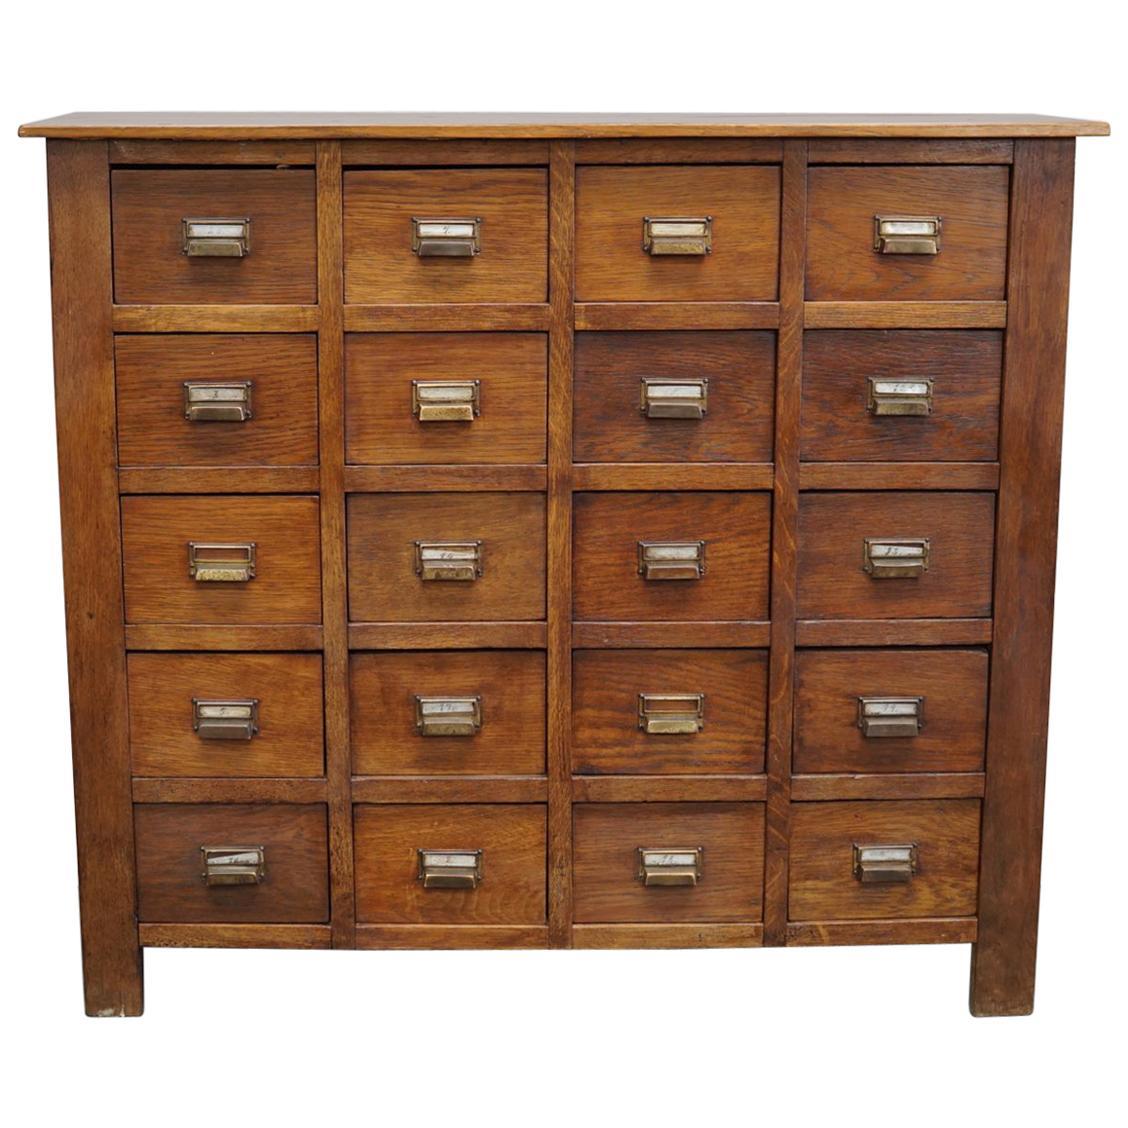 Bon Vintage French Oak Apothecary Cabinet, 1930s